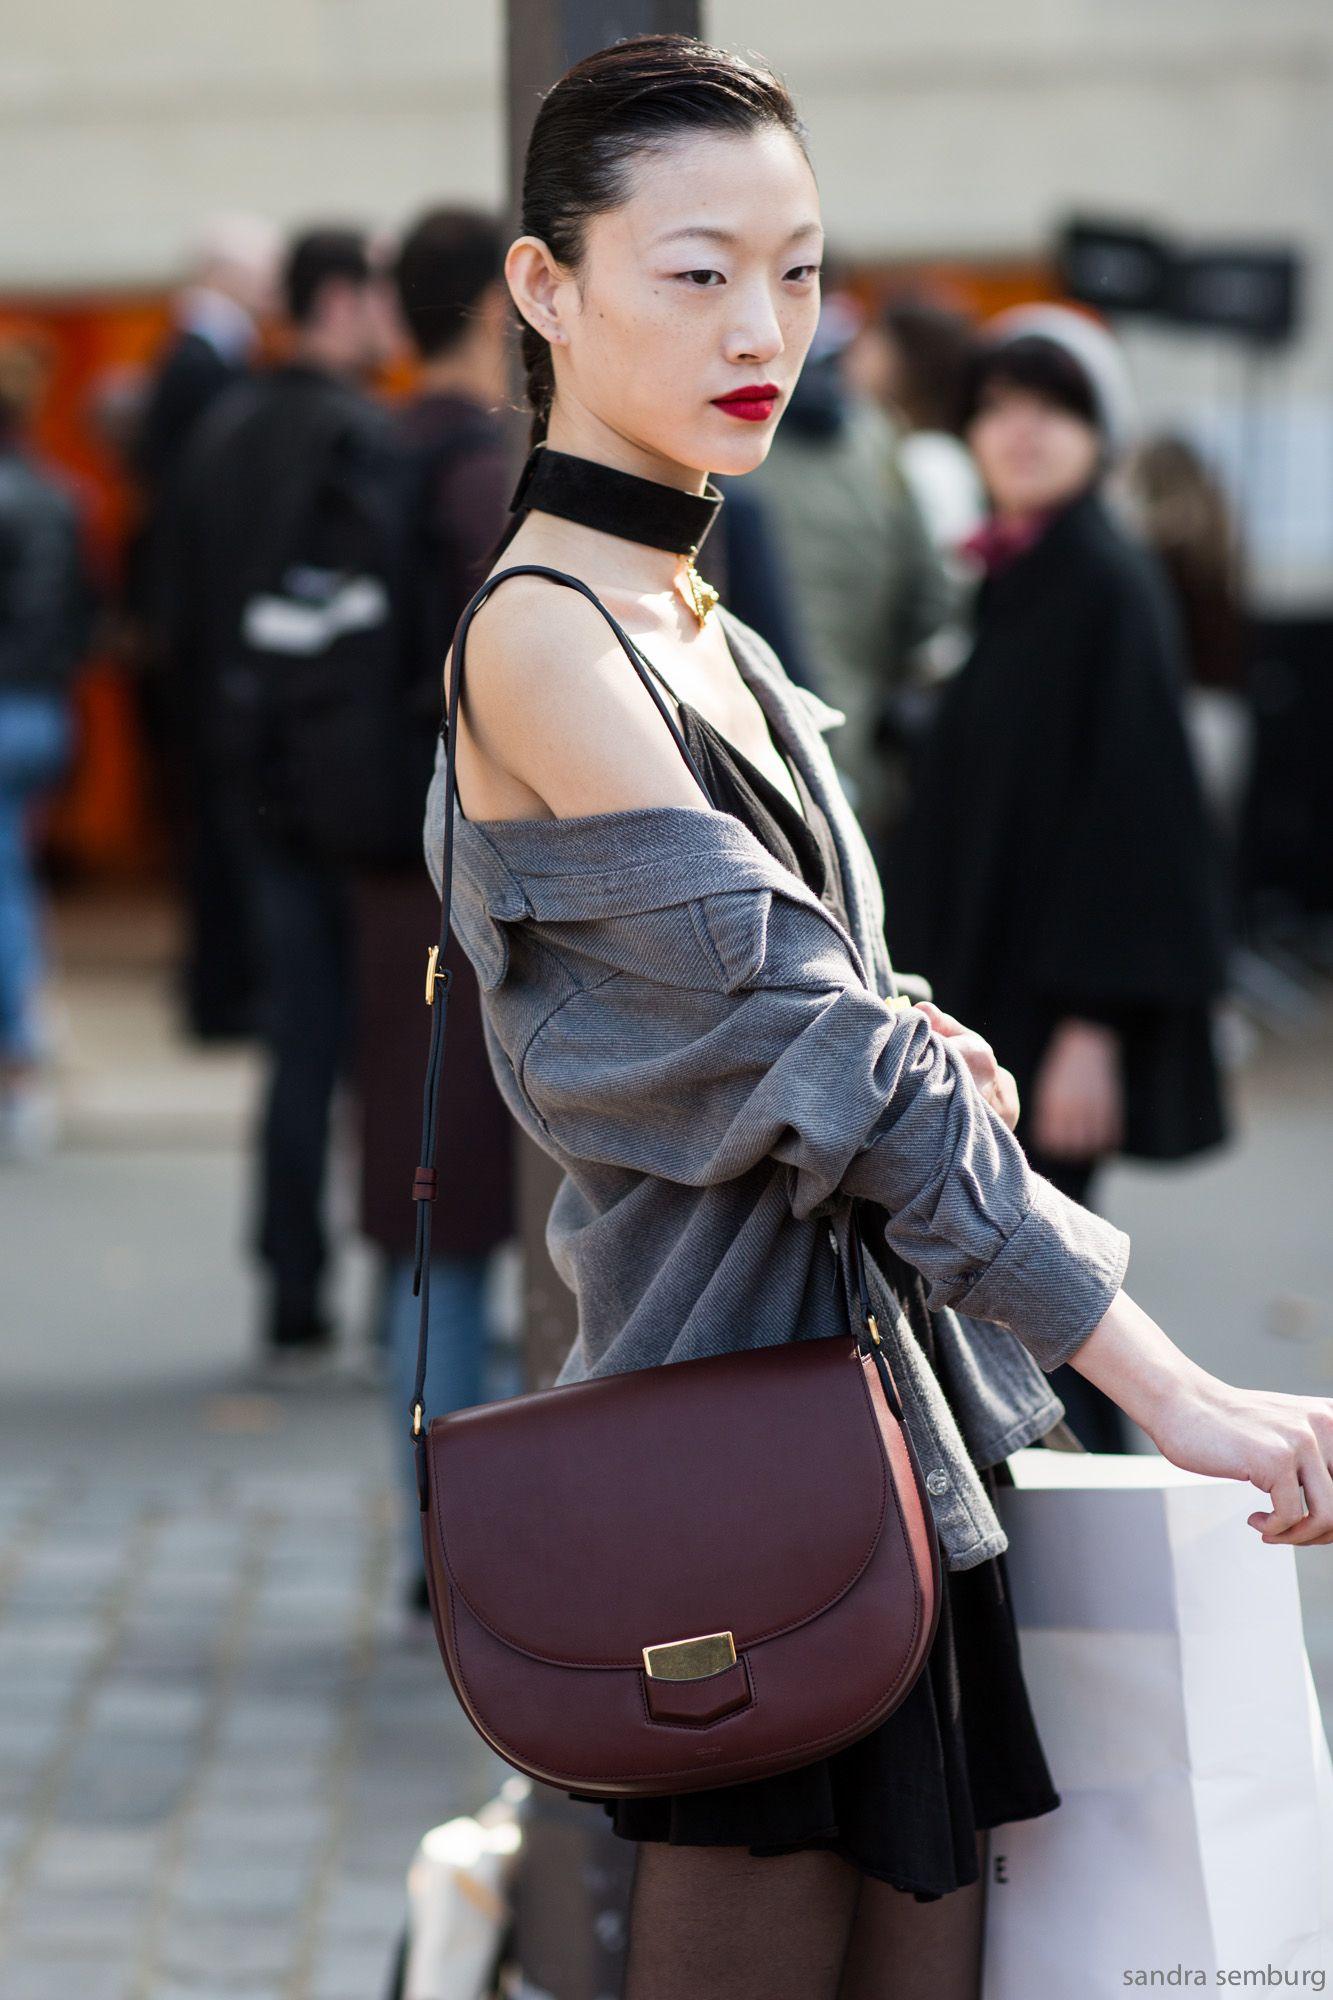 Celine201510041338 celine favorite handbags bags